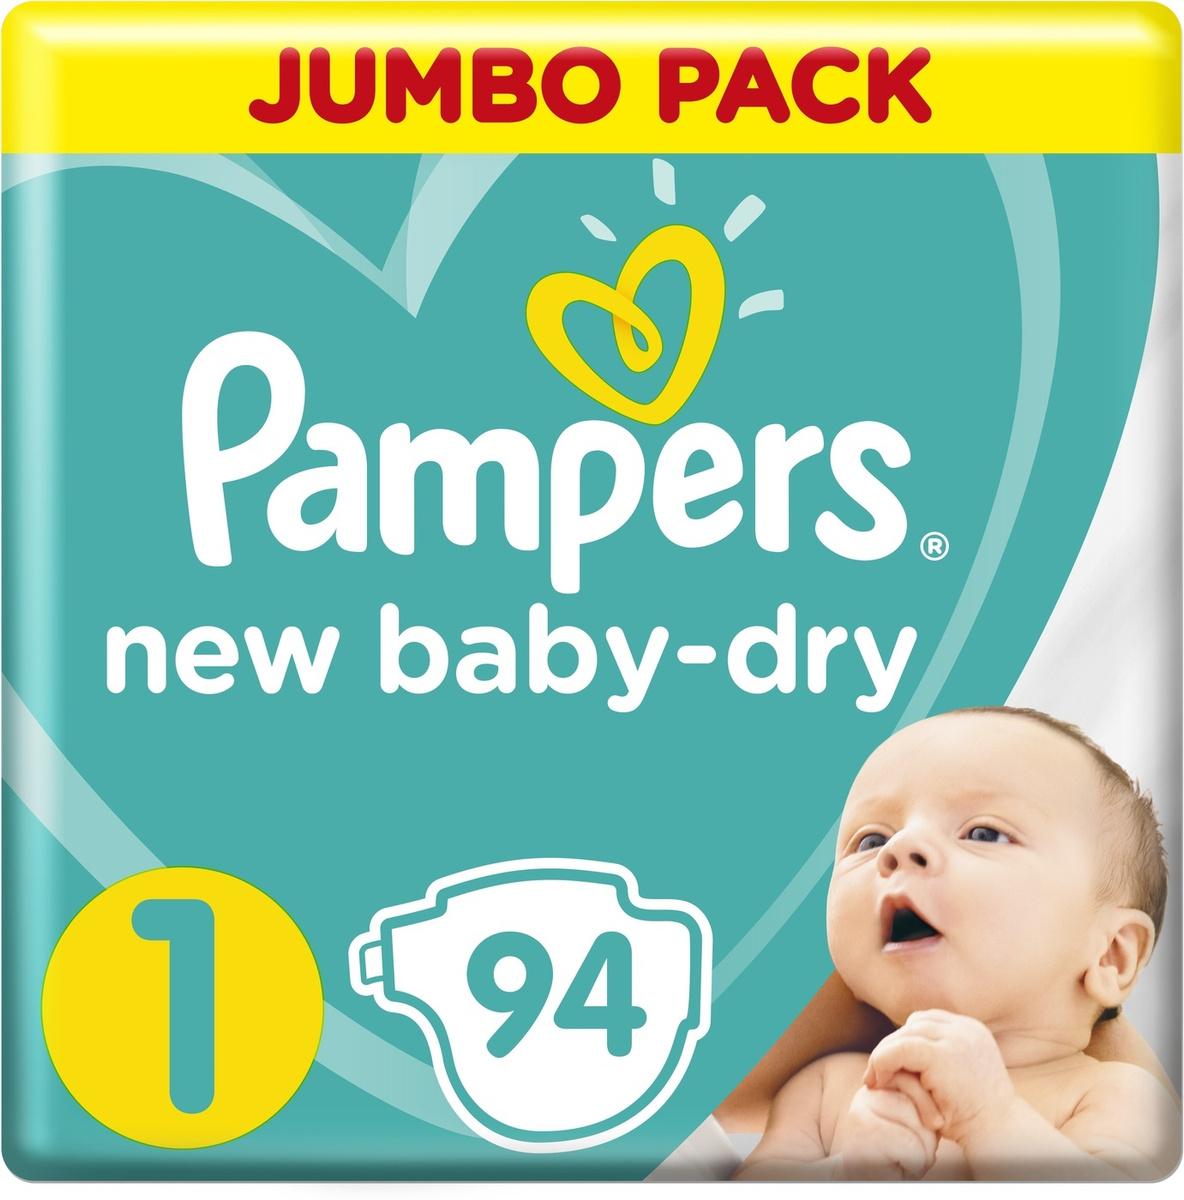 Pampers Подгузники New Baby-Dry 2-5 кг (размер 1) 94 шт #1